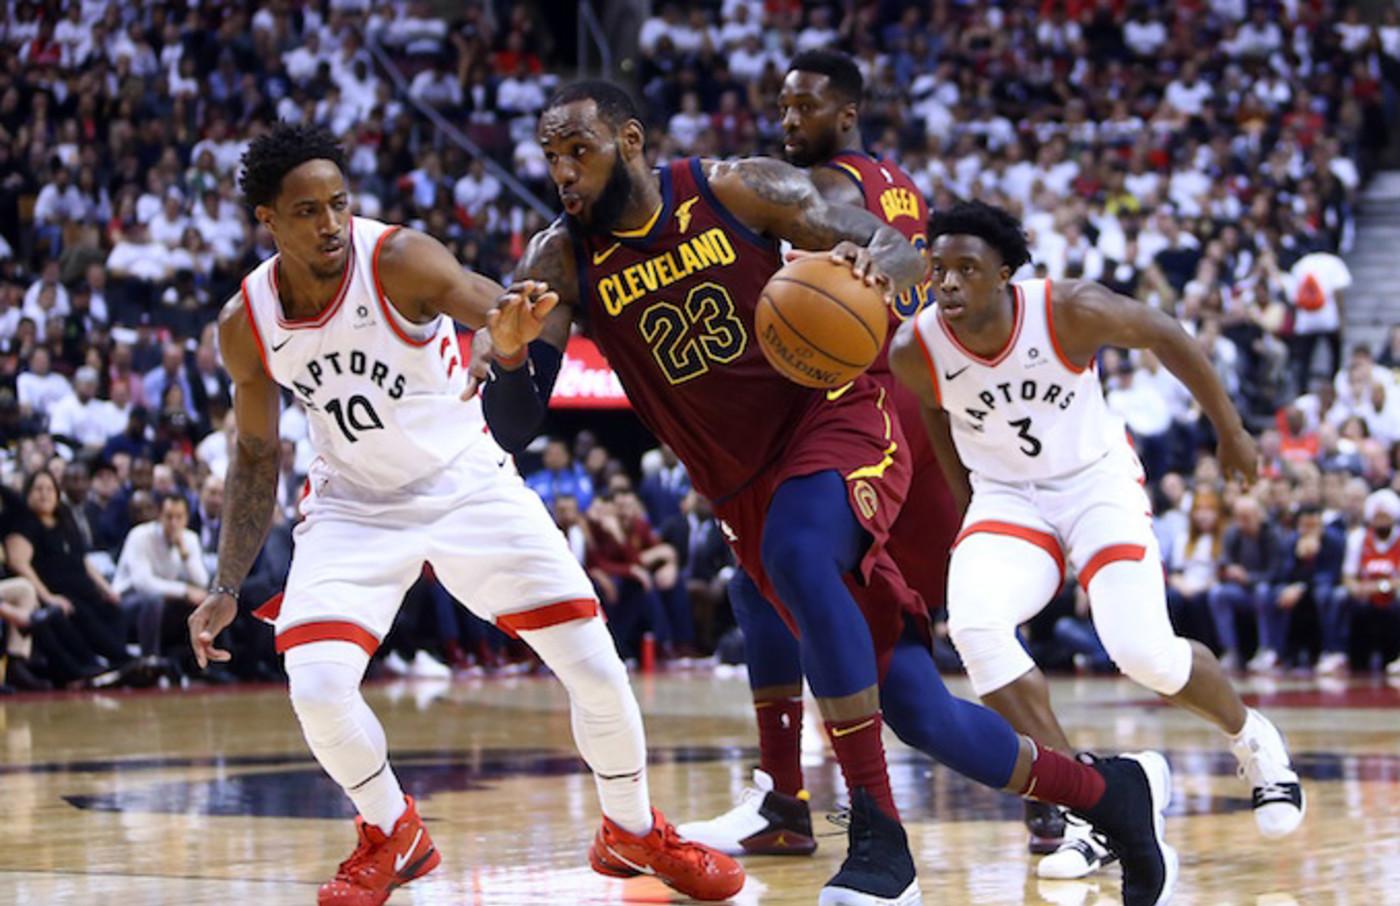 Cleveland Cavaliers dribbles the ball as DeMar DeRozan defends.